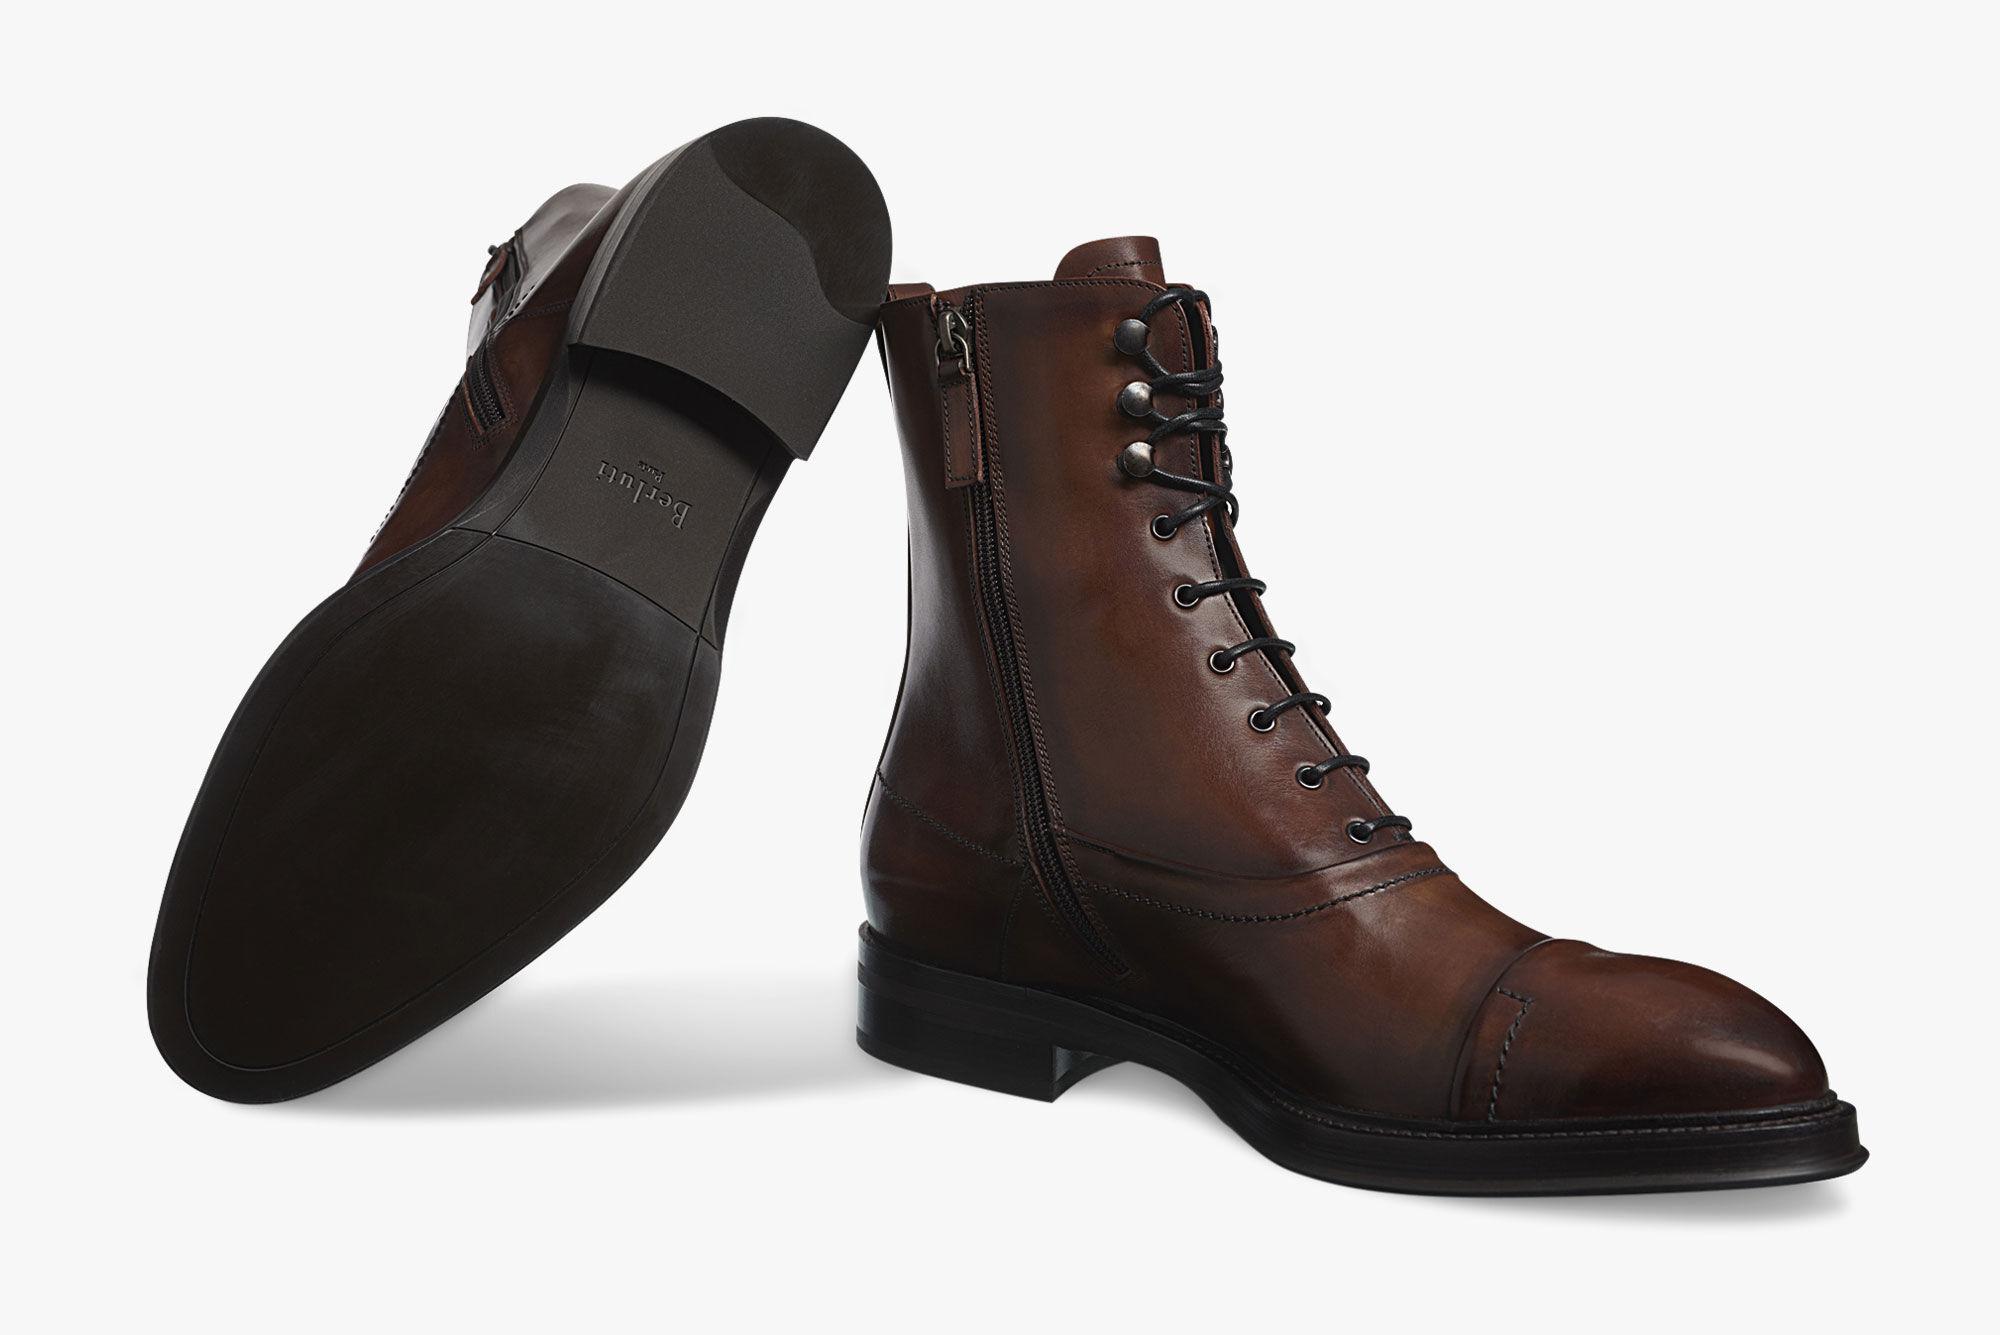 best sale online outlet excellent Berluti Eris Bergen Leather Boots outlet store sale online outlet prices jkbwev